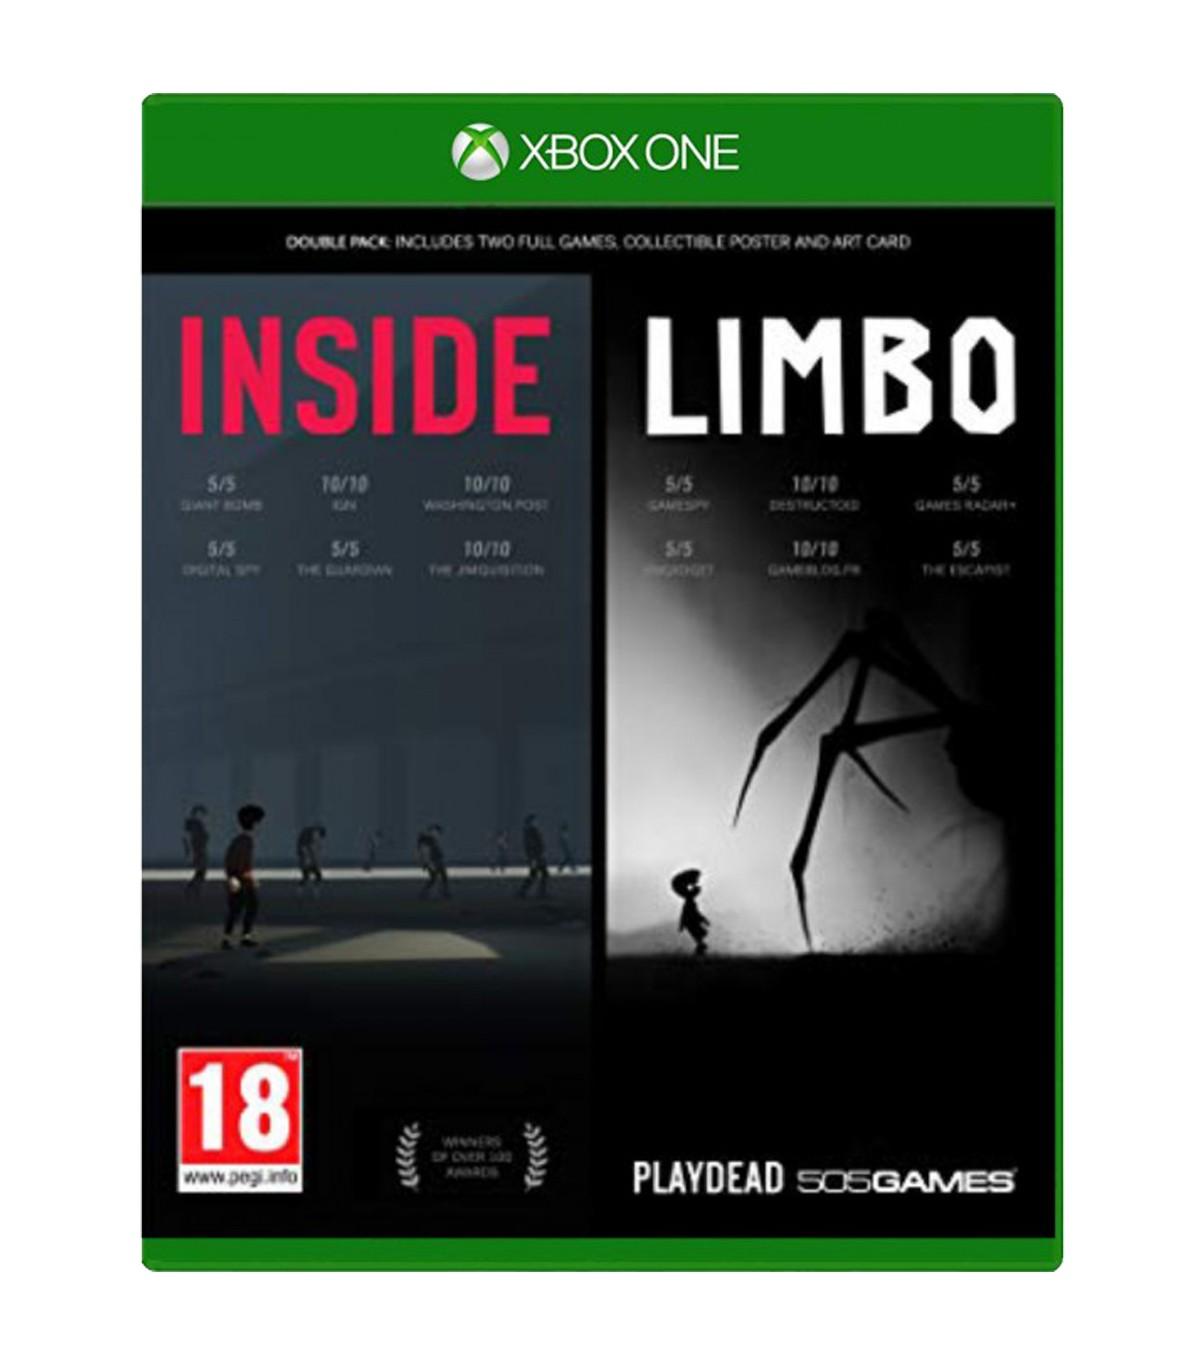 بازی INSIDE / LIMBO Double Pack کارکرده - ایکس باکس وان